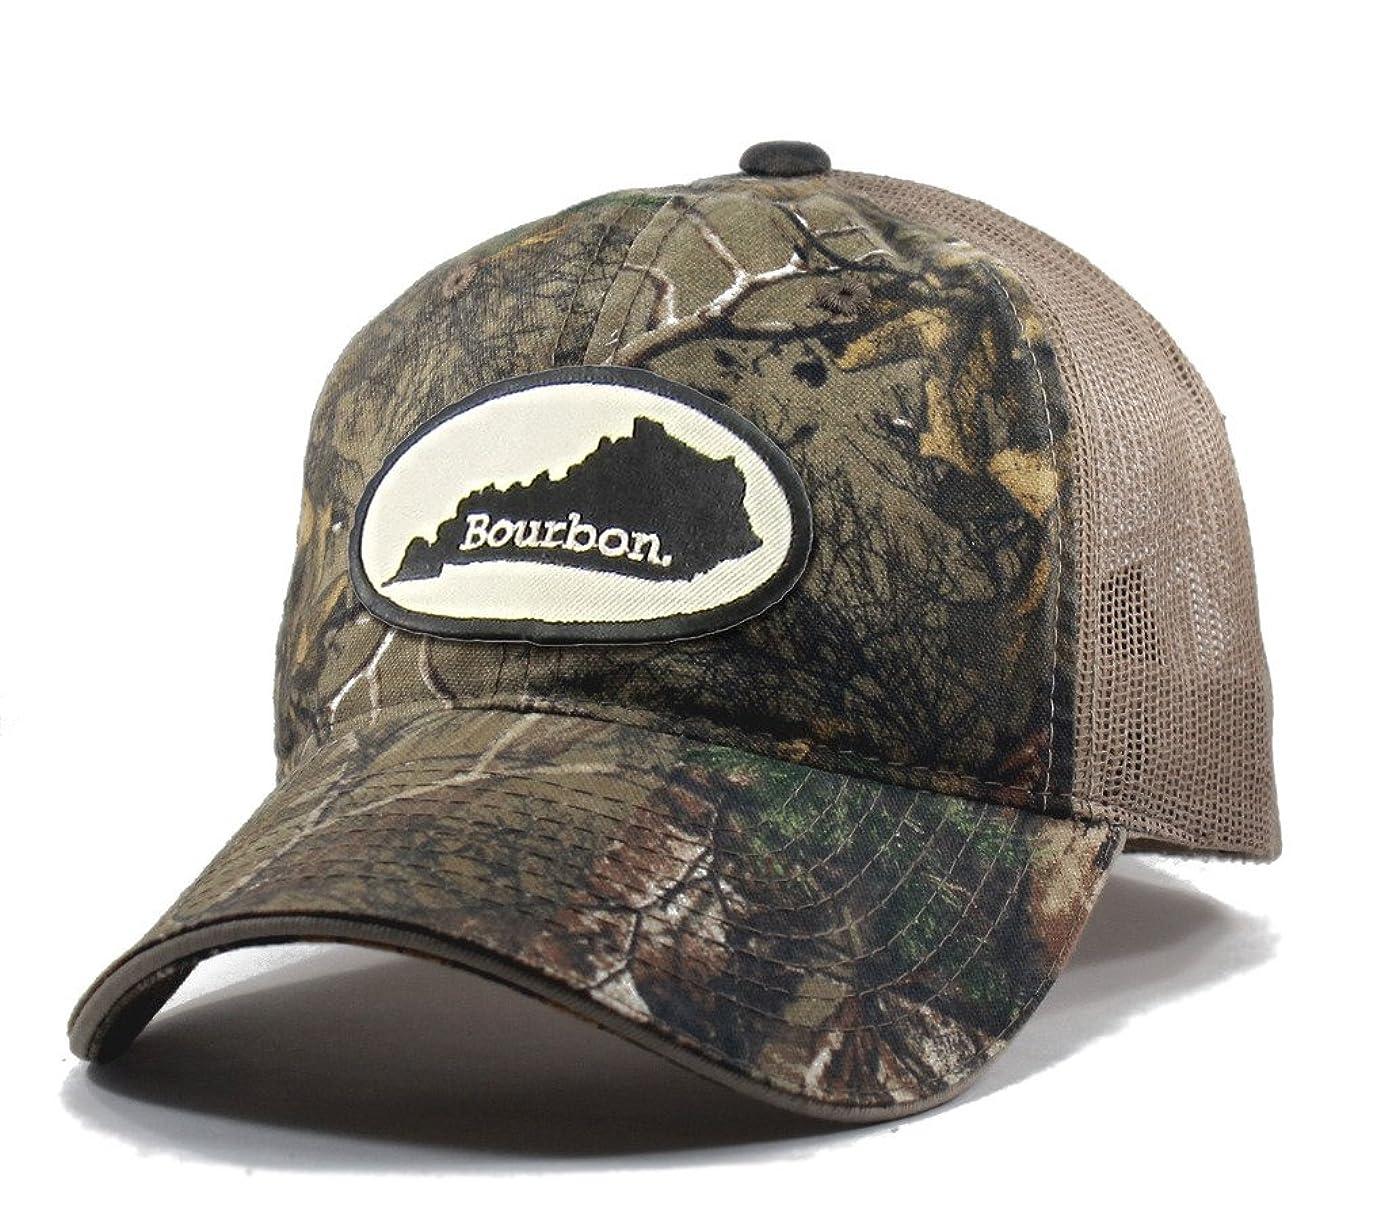 Homeland Tees Men's Kentucky Bourbon Realtree Camo Trucker Hat